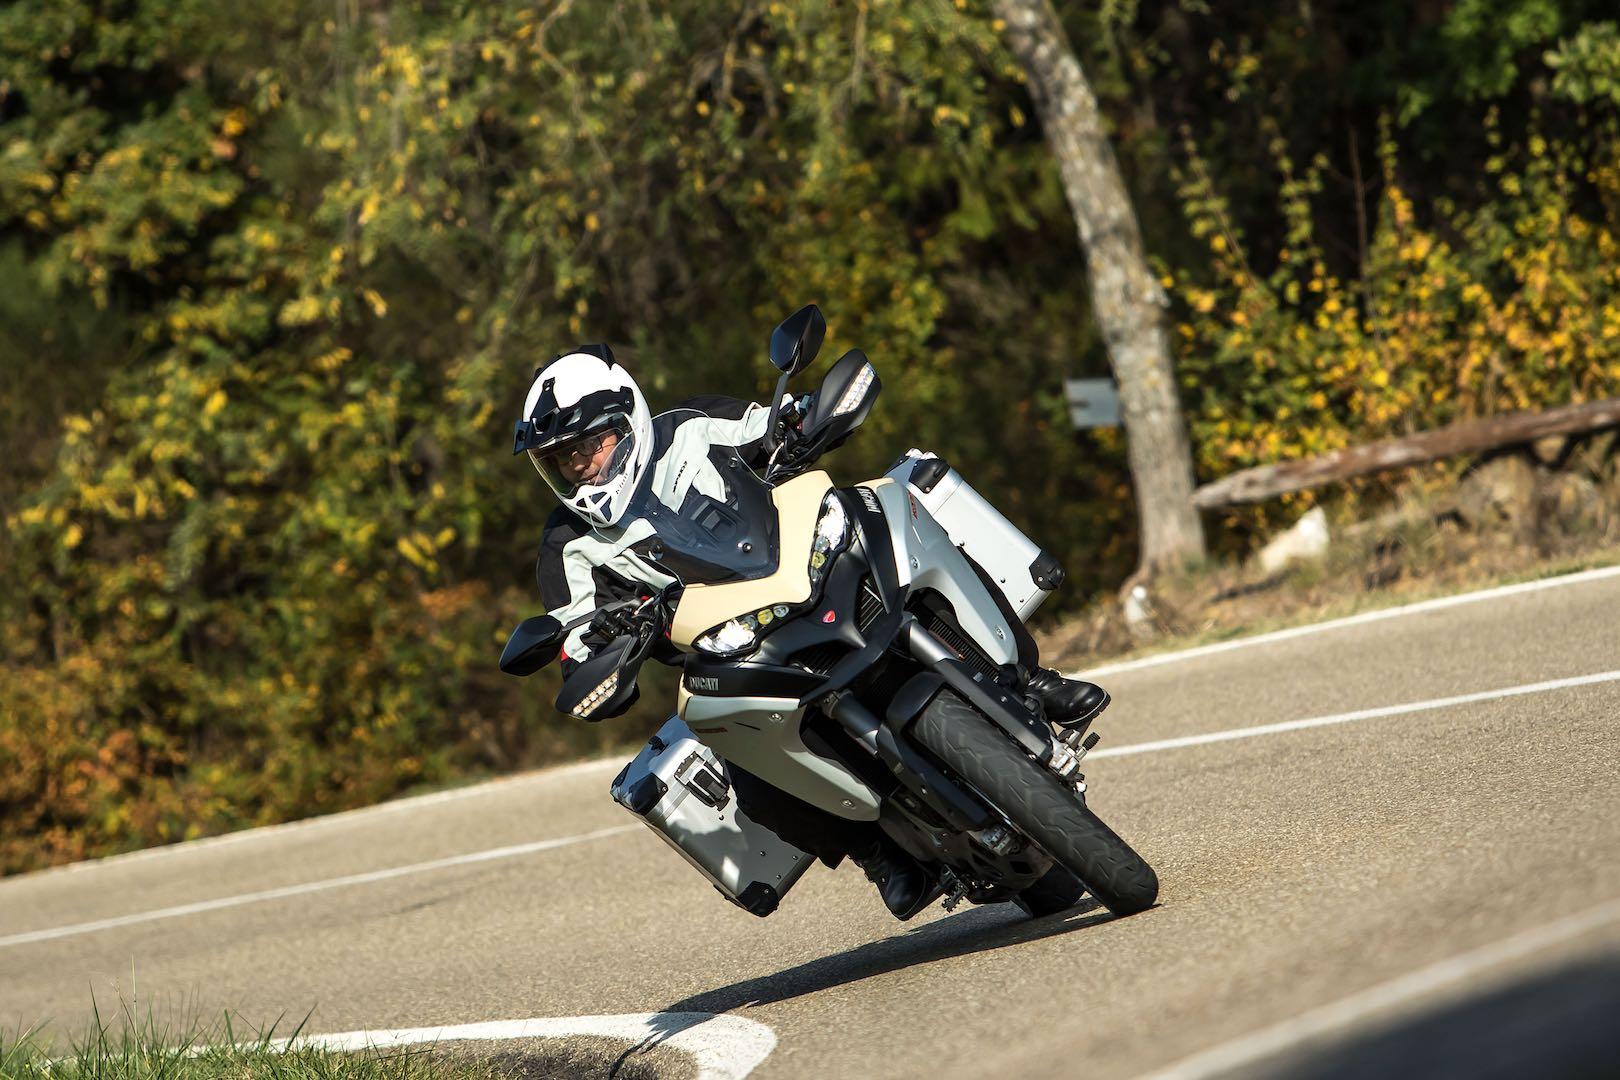 2019 Ducati Multistrada 1260 Enduro top speed